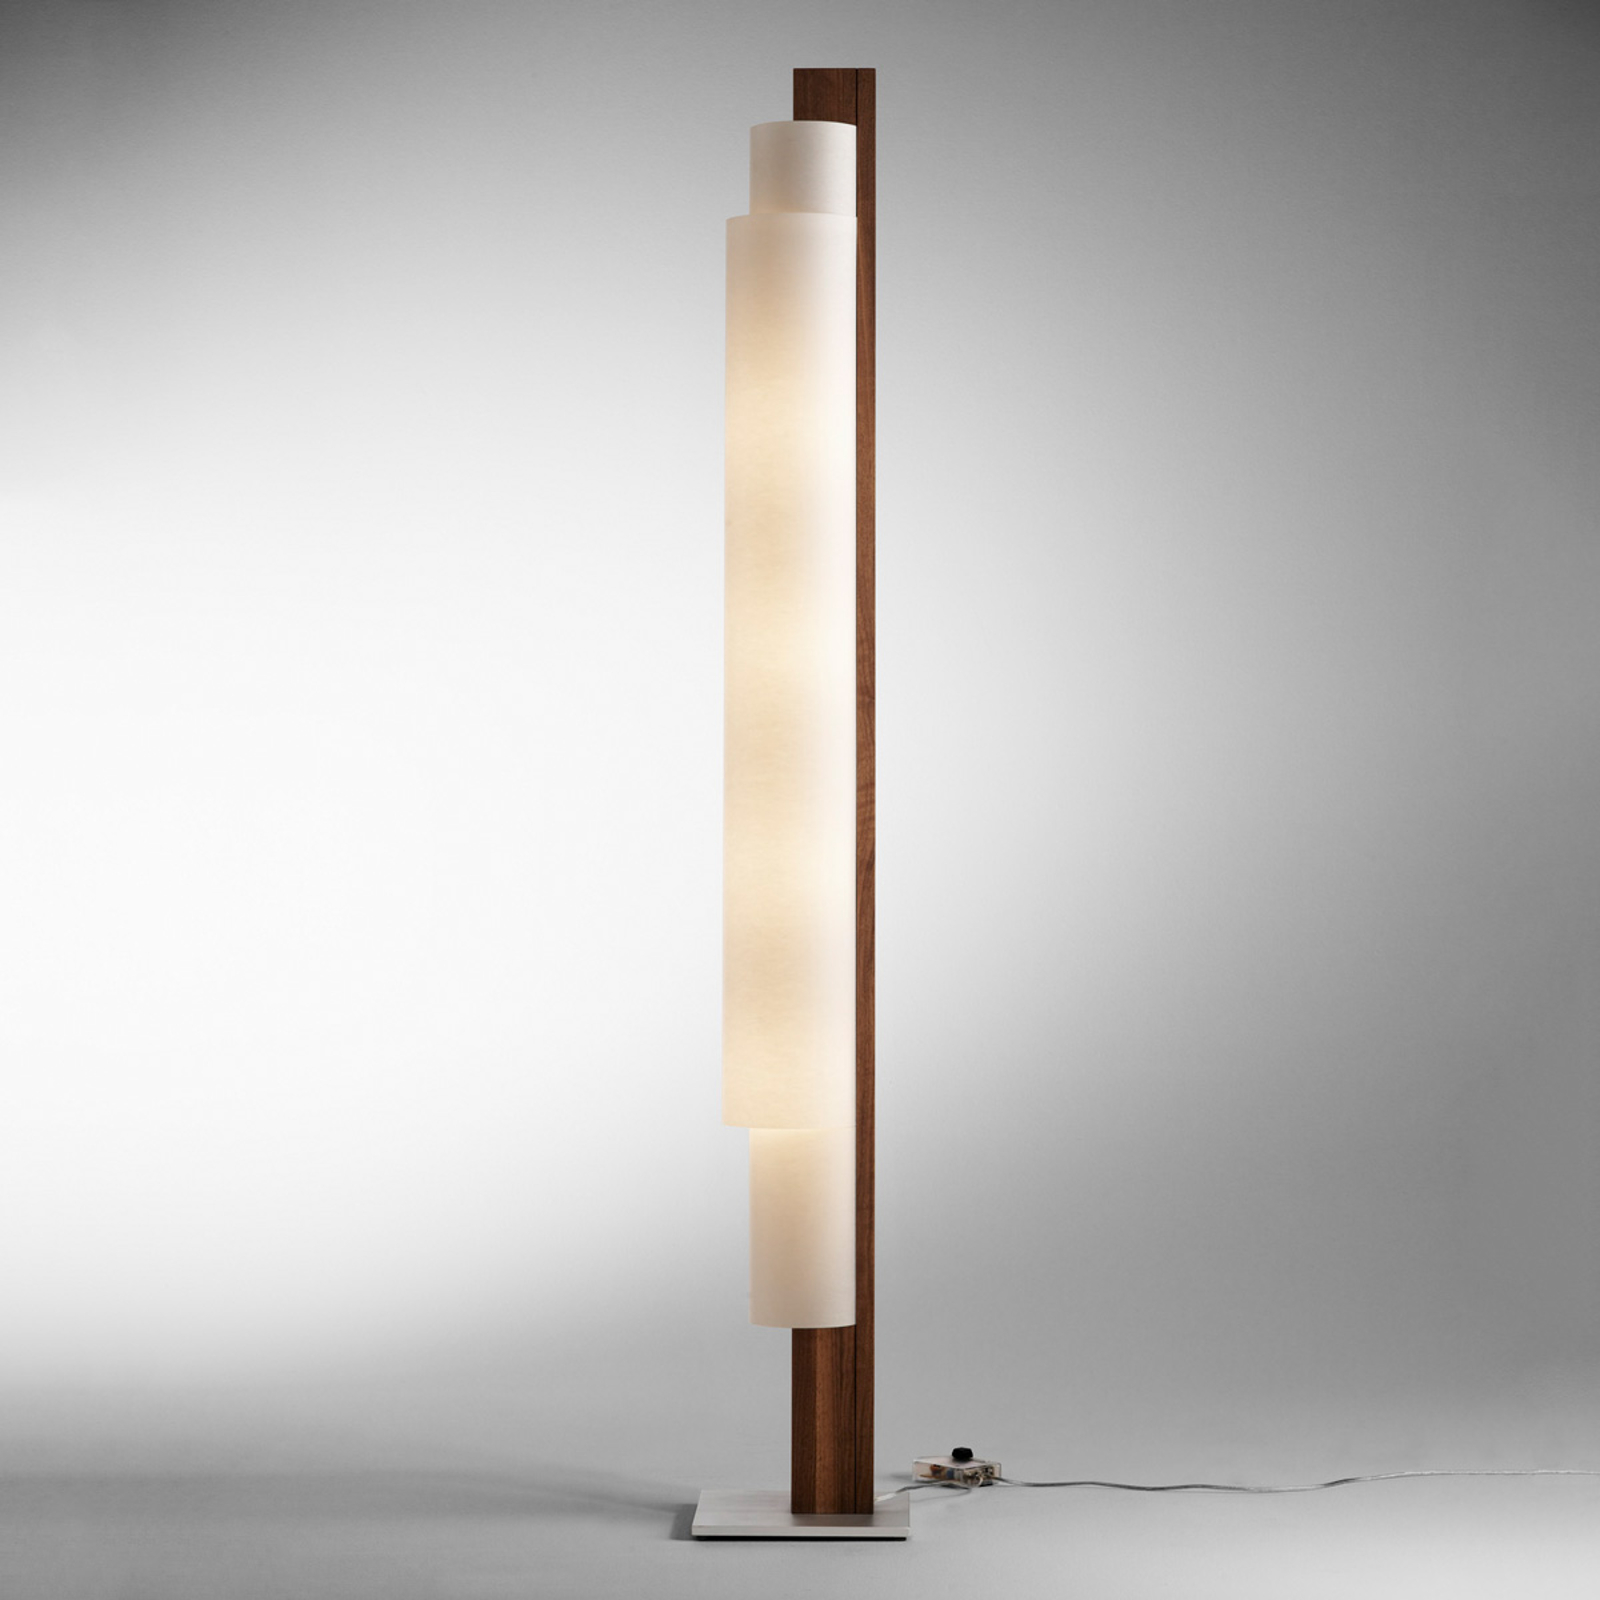 Lampa stojąca LED STELE, orzech